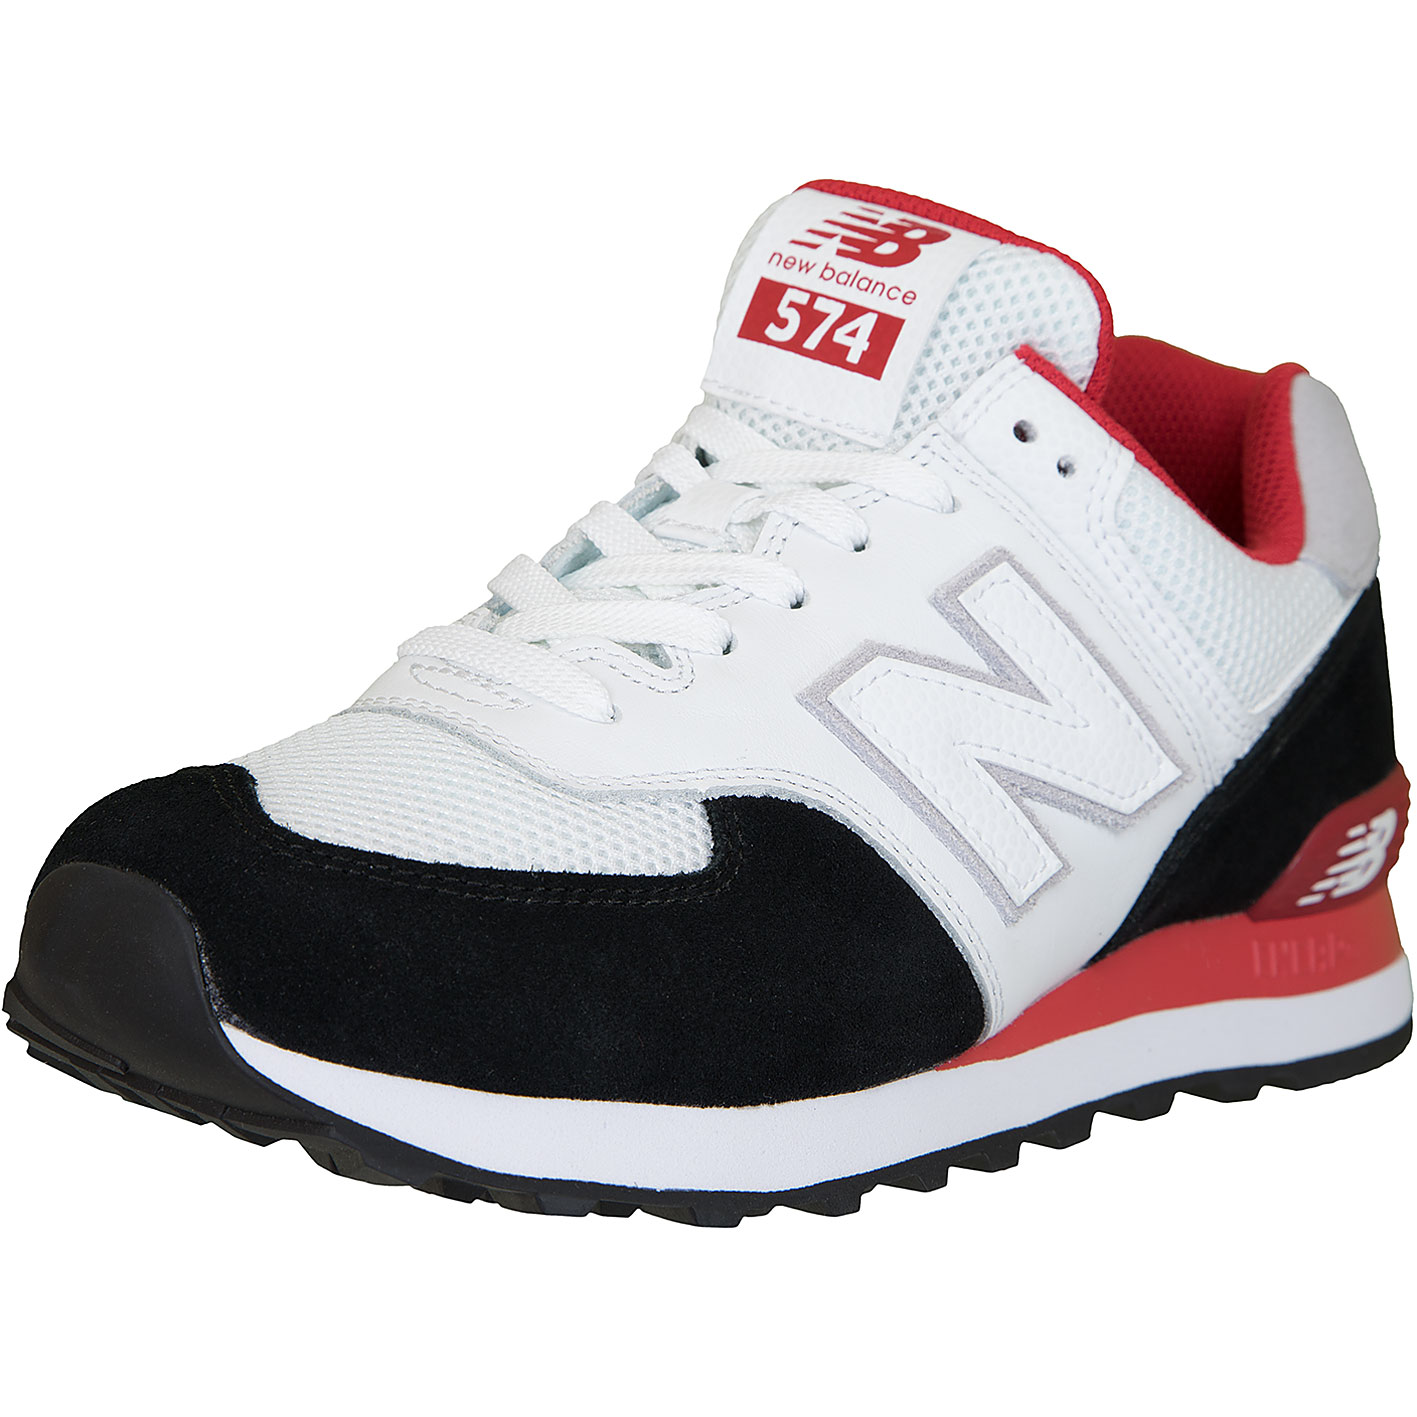 New Balance Sneaker 574 Leder/Textil weiß/schwarz/rot